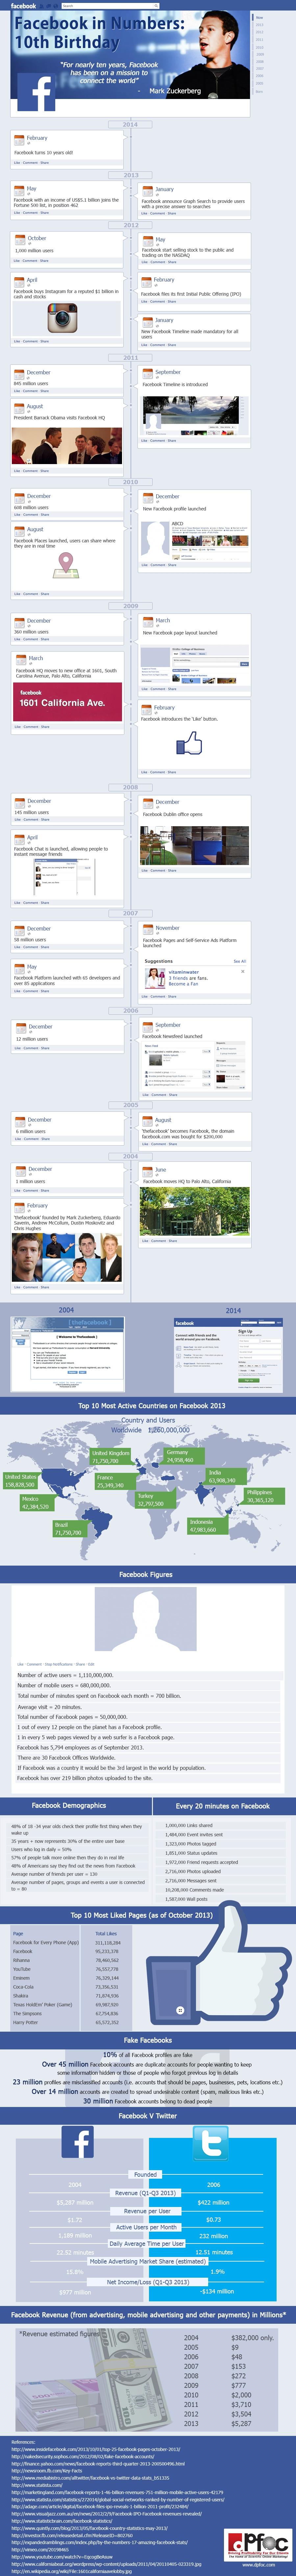 10-Jahre-Facebook-Infografik